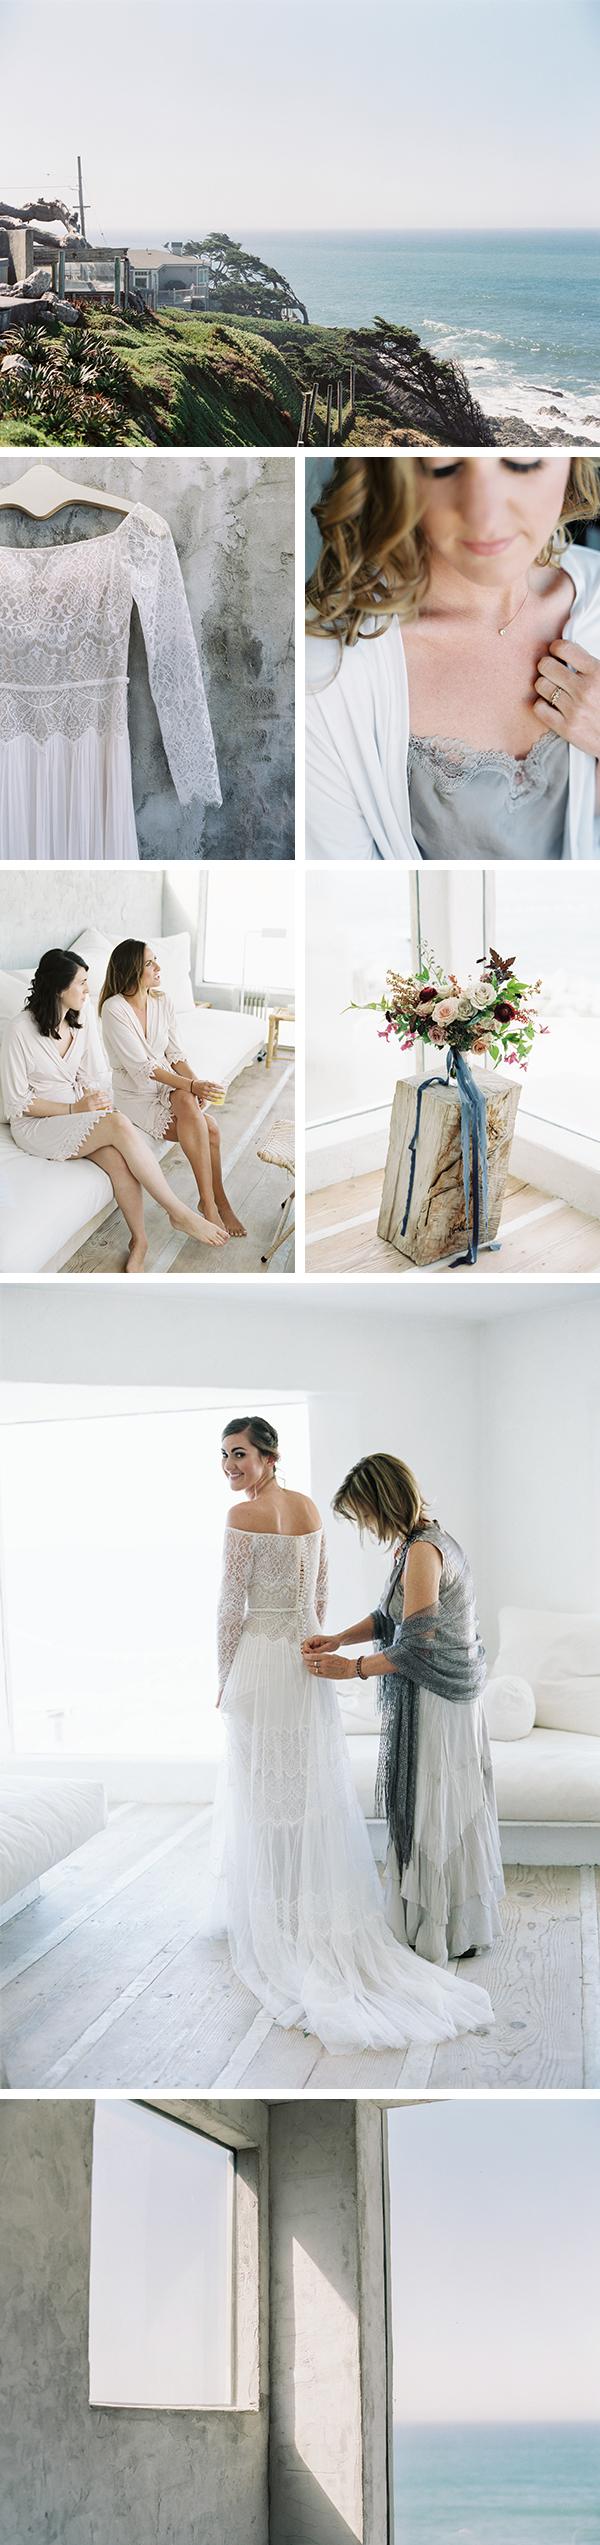 Minted real wedding, Montara, CA